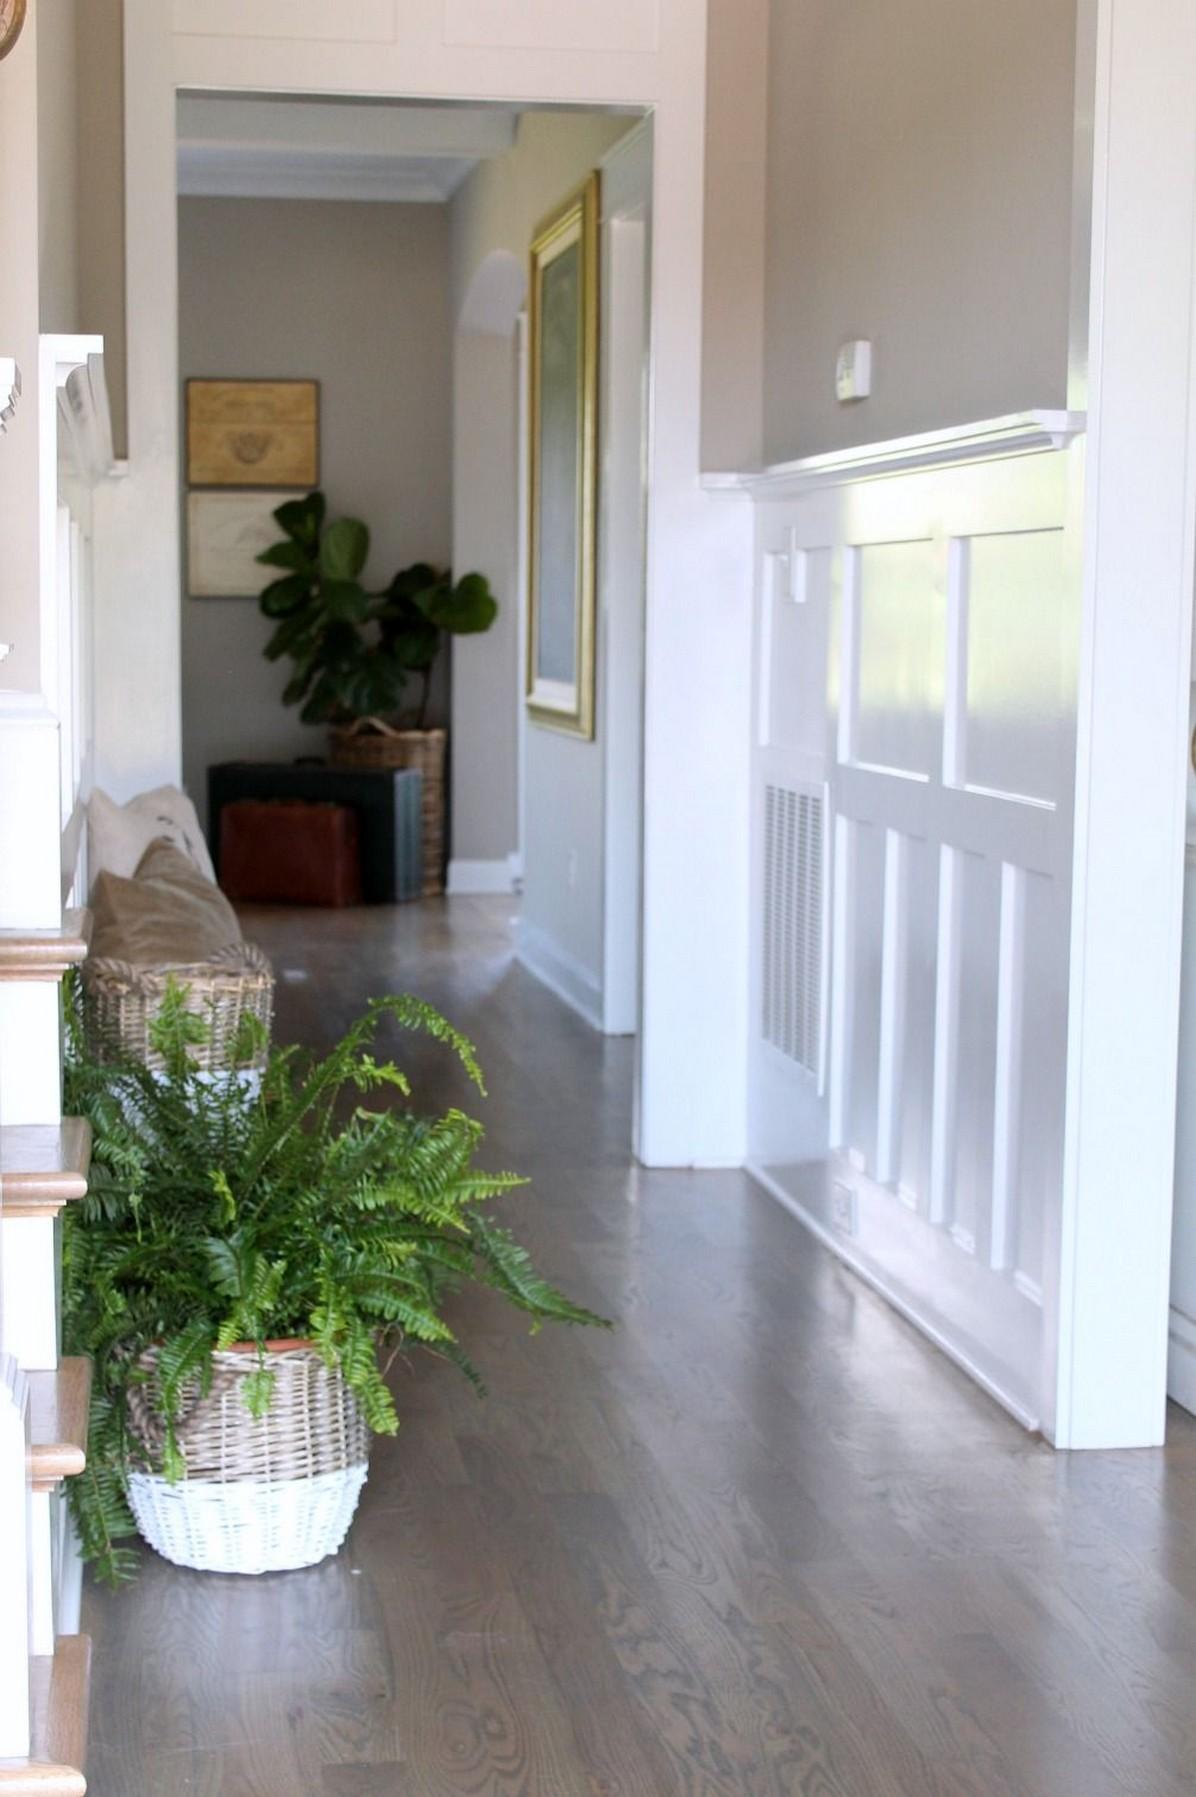 61 Farmhouse Style Steel Sheds Home Decor 12